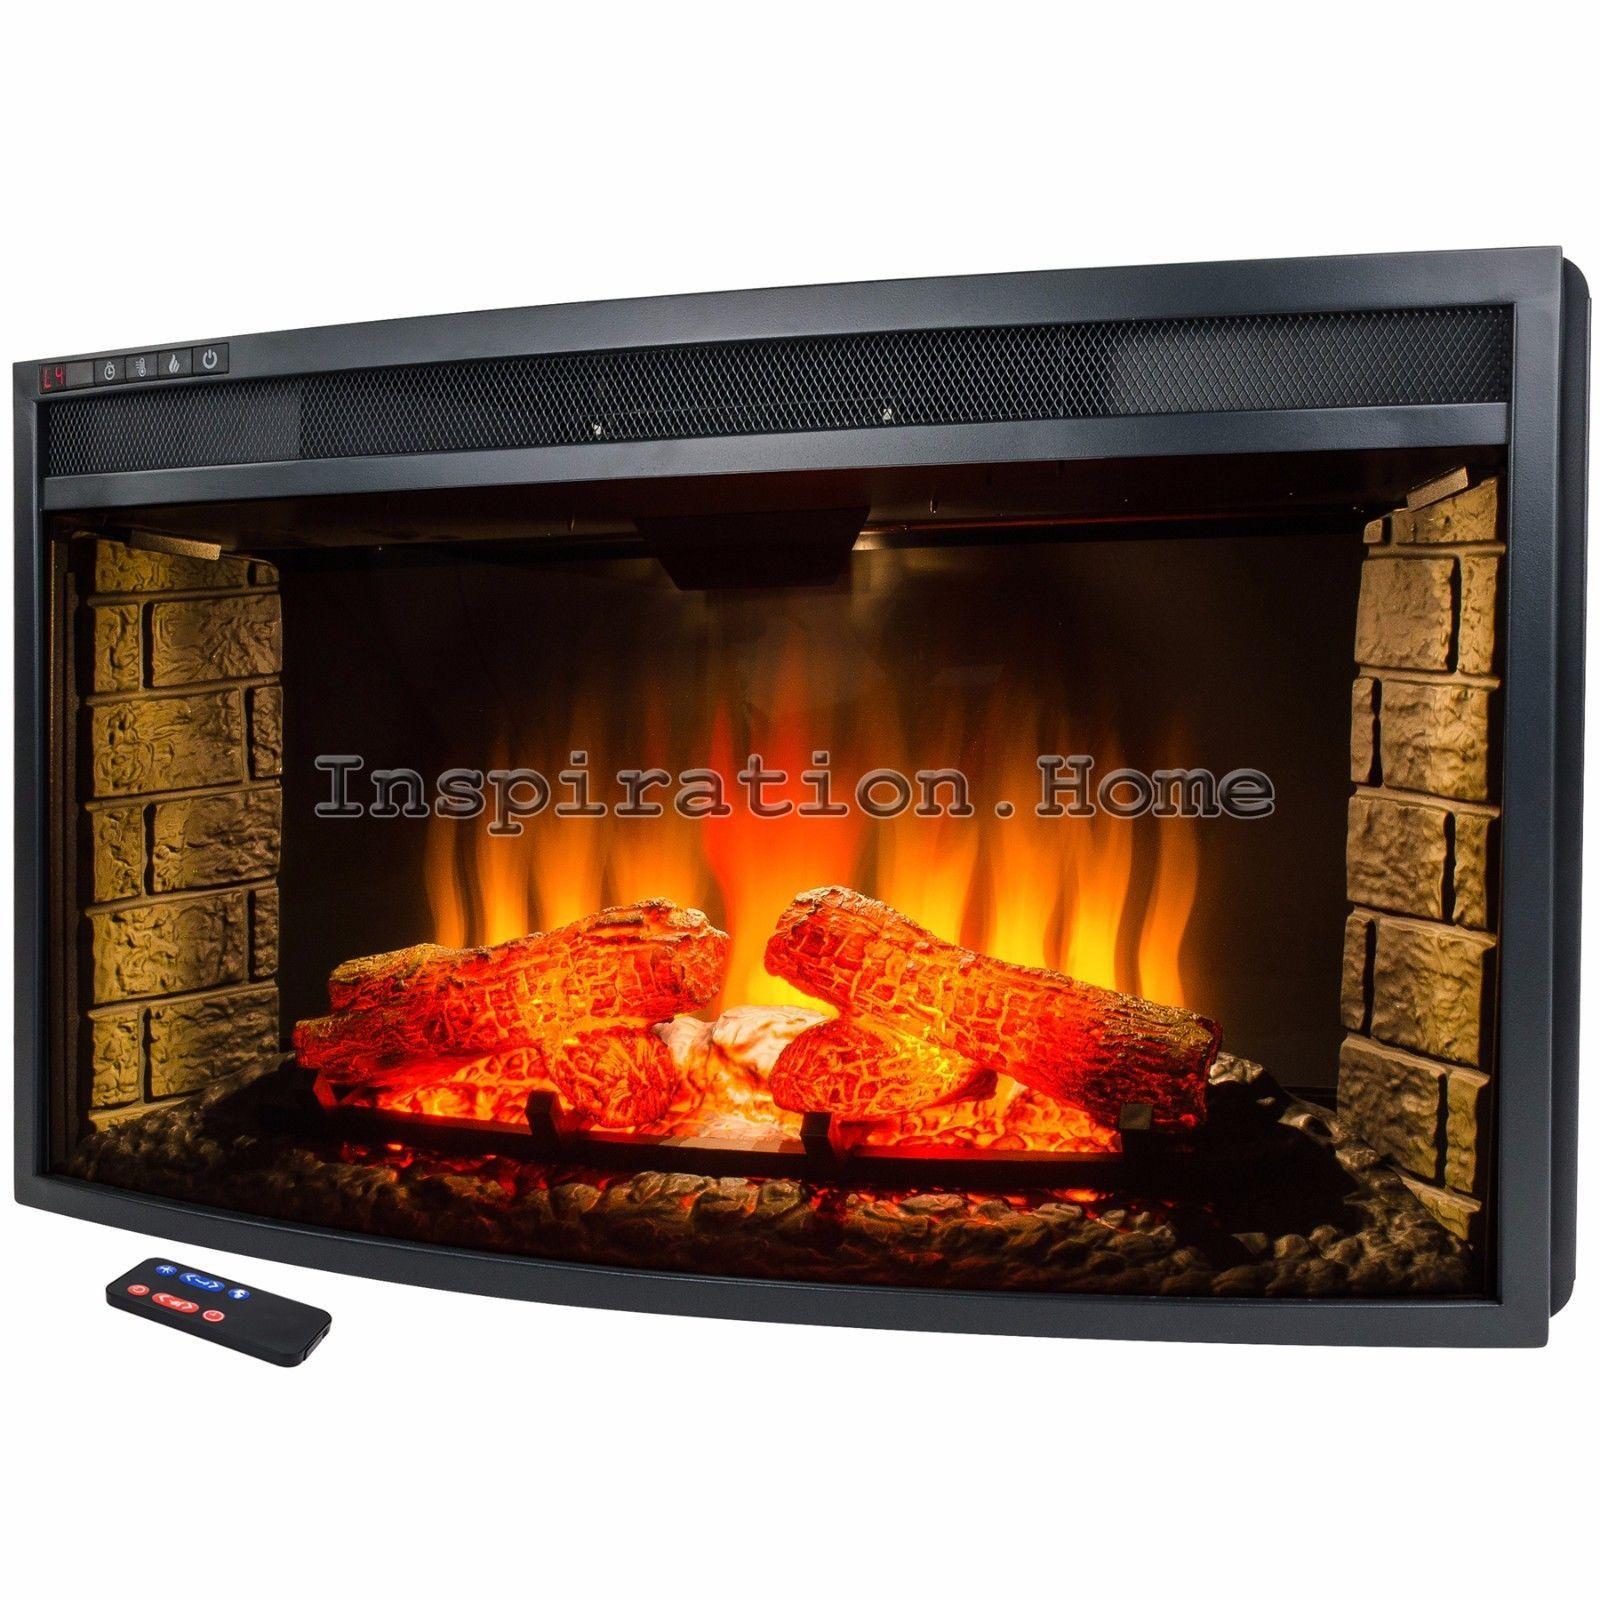 4b2f127b5976b079afa214e958d66207 Top Result 50 Awesome Corner Electric Fireplace Pic 2018 Jdt4